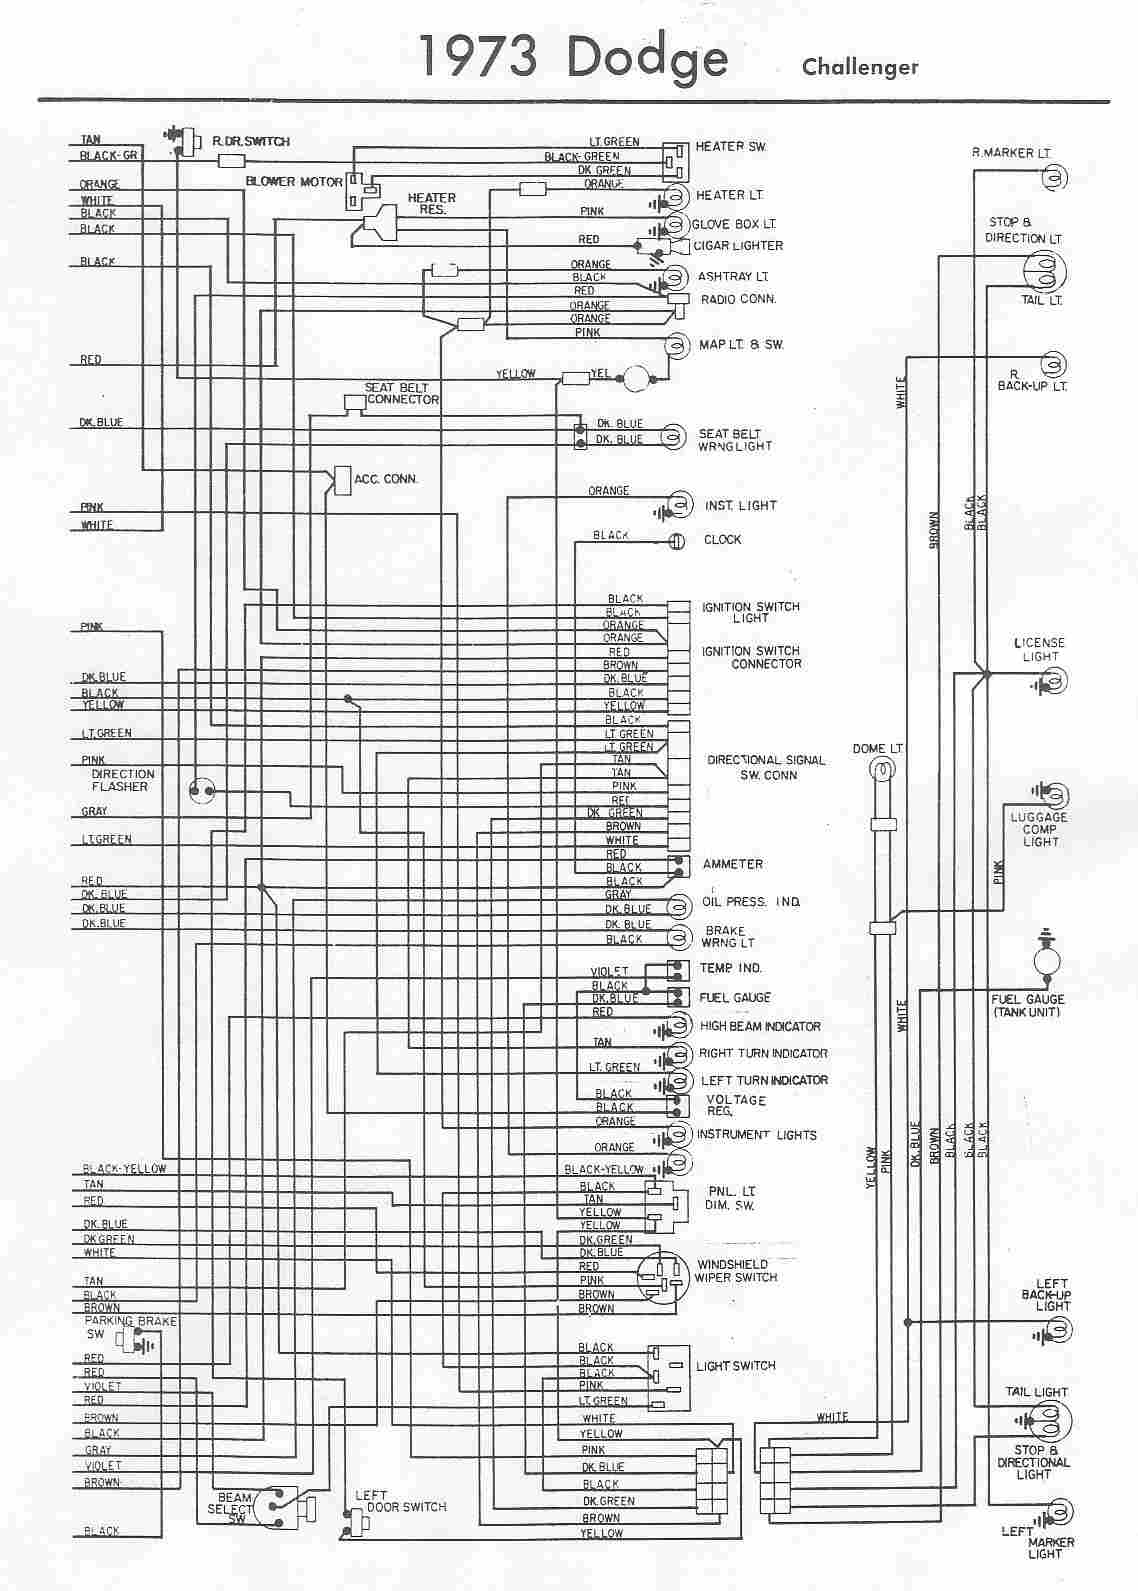 hight resolution of 1973 dodge truck wiring diagram 1973 dodge truck wiring diagram data library u2022rh